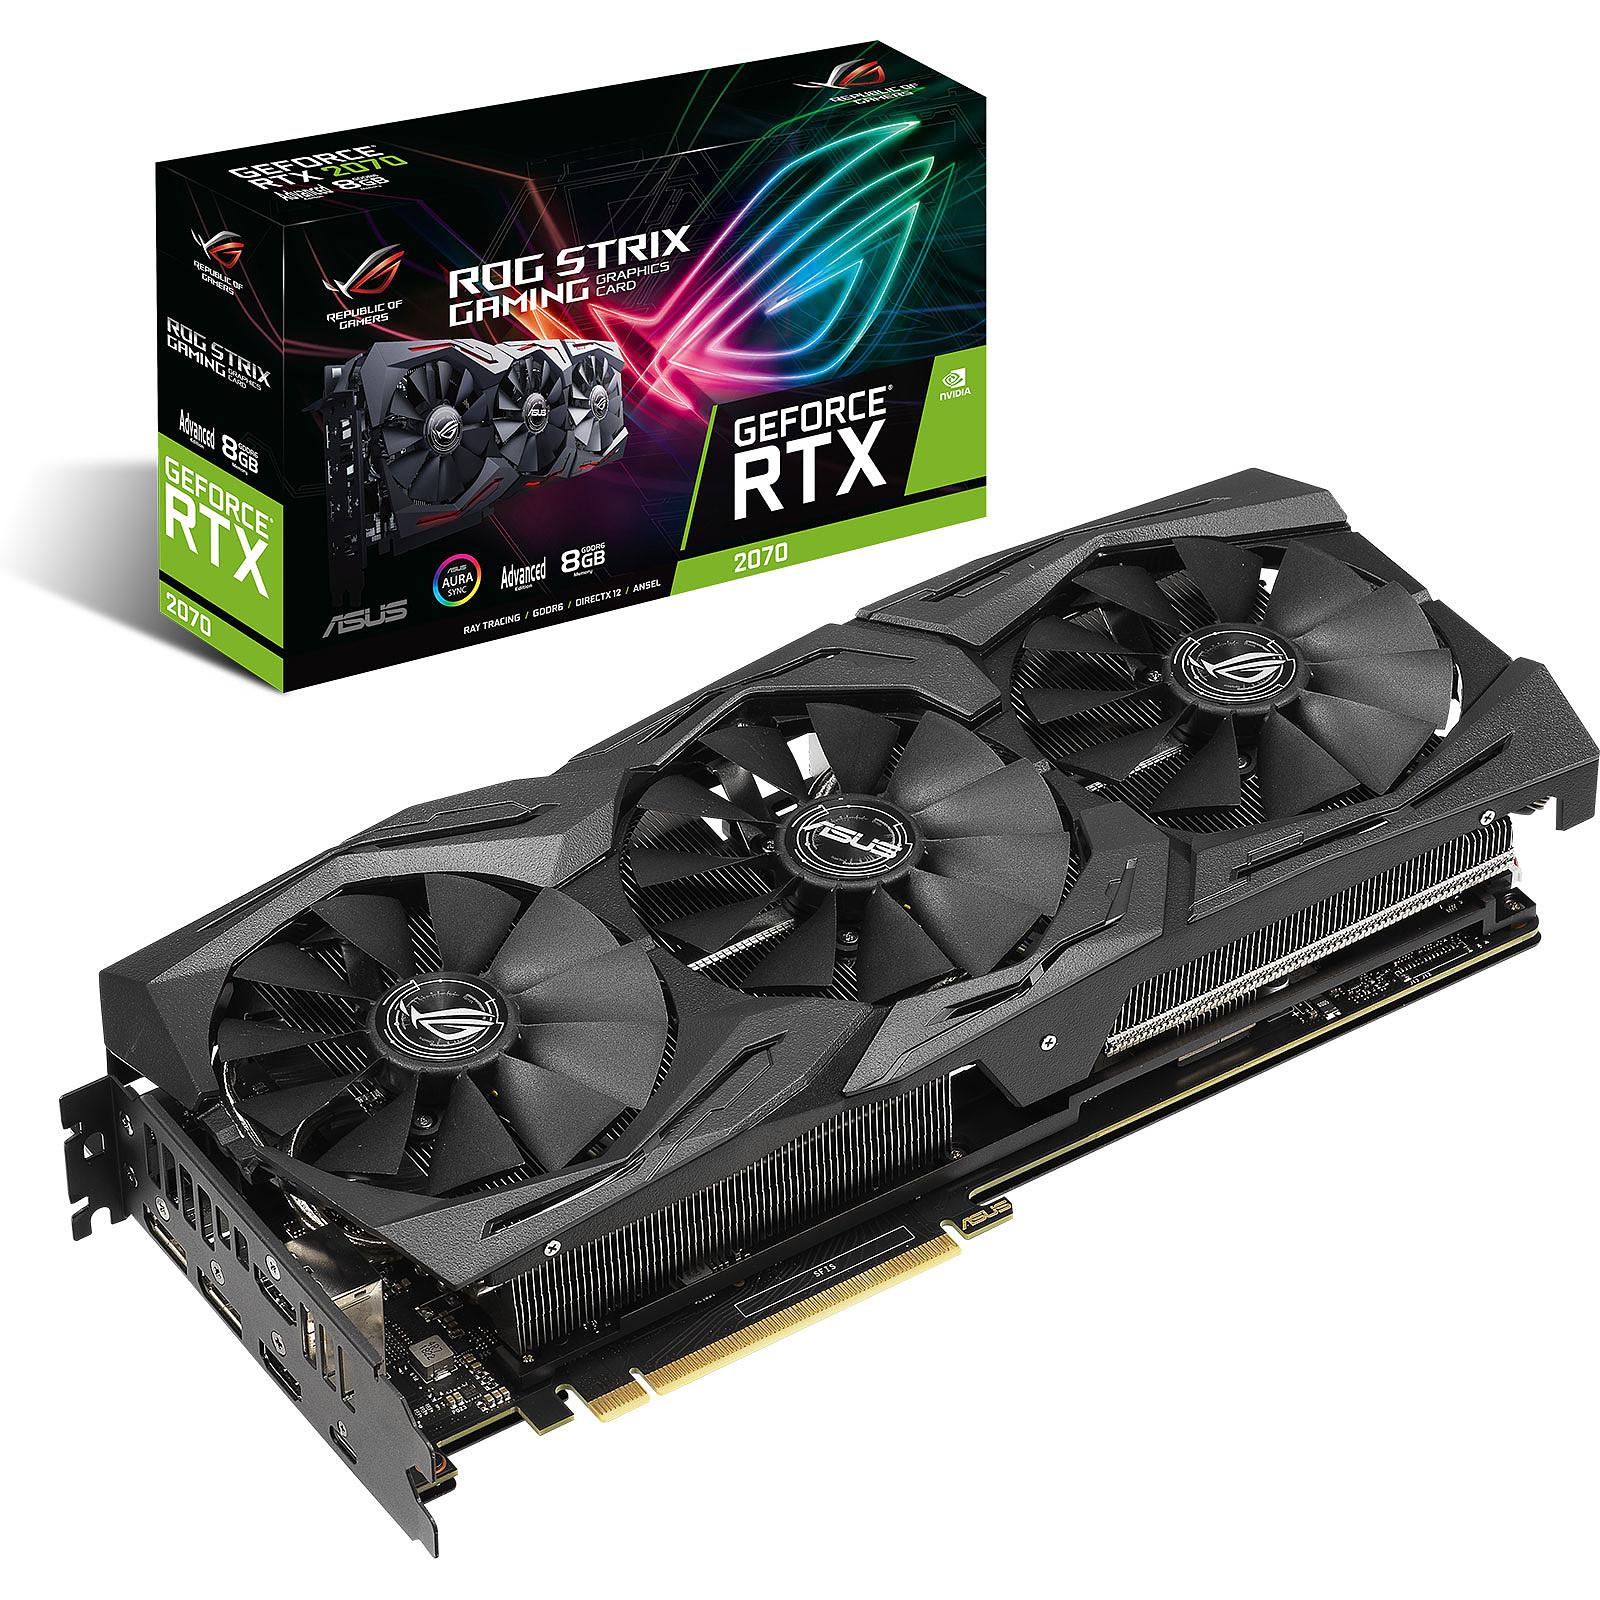 ASUS GeForce RTX 2070 ROG-STRIX-RTX2070-A8G-GAMING